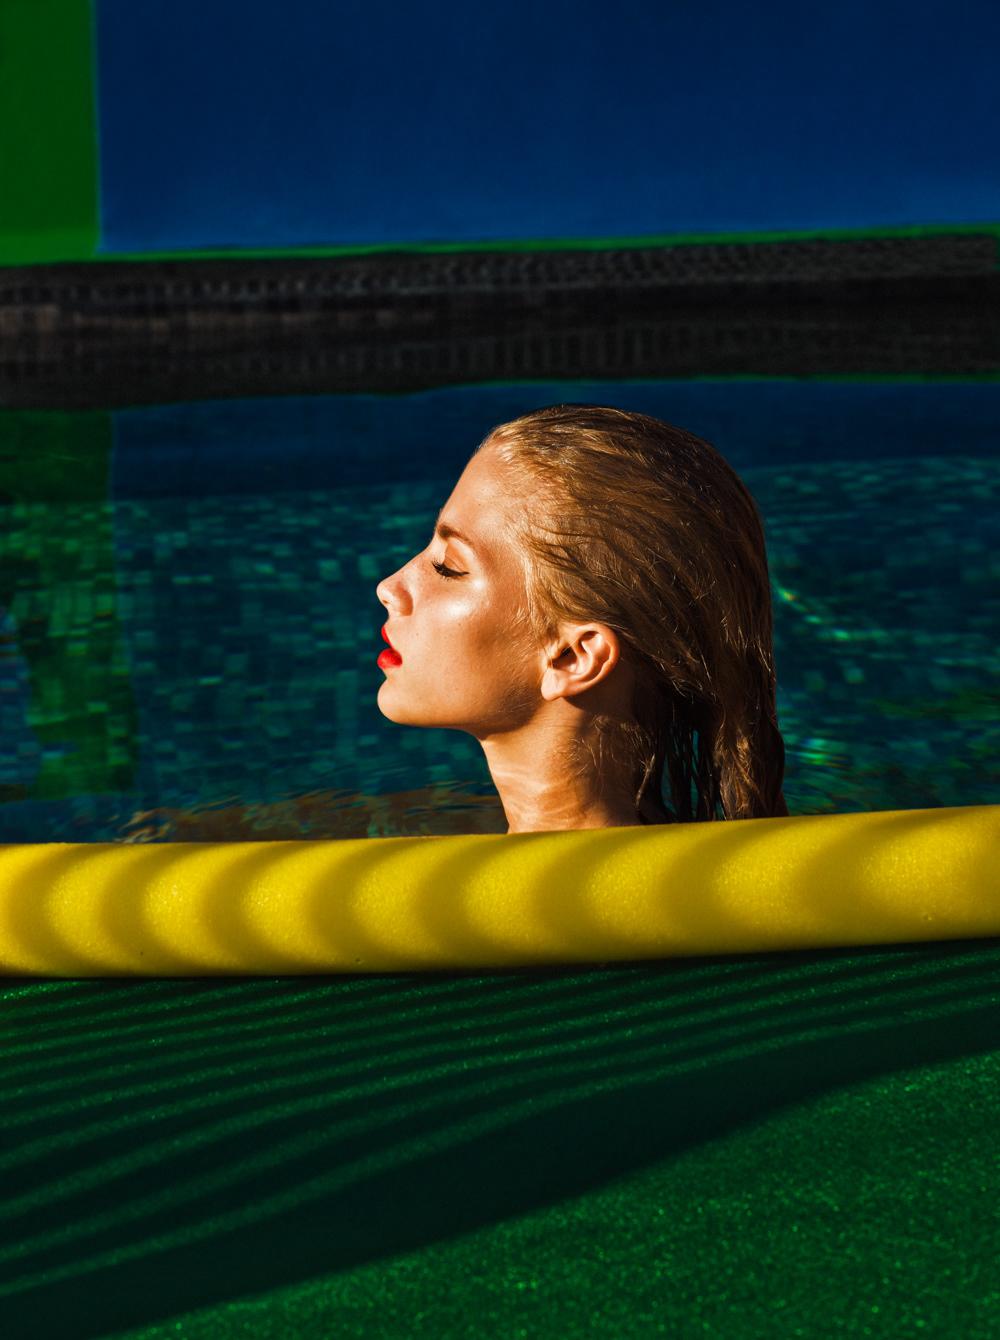 Dreamer Pool Monaco / фото Elena Iv-skaya